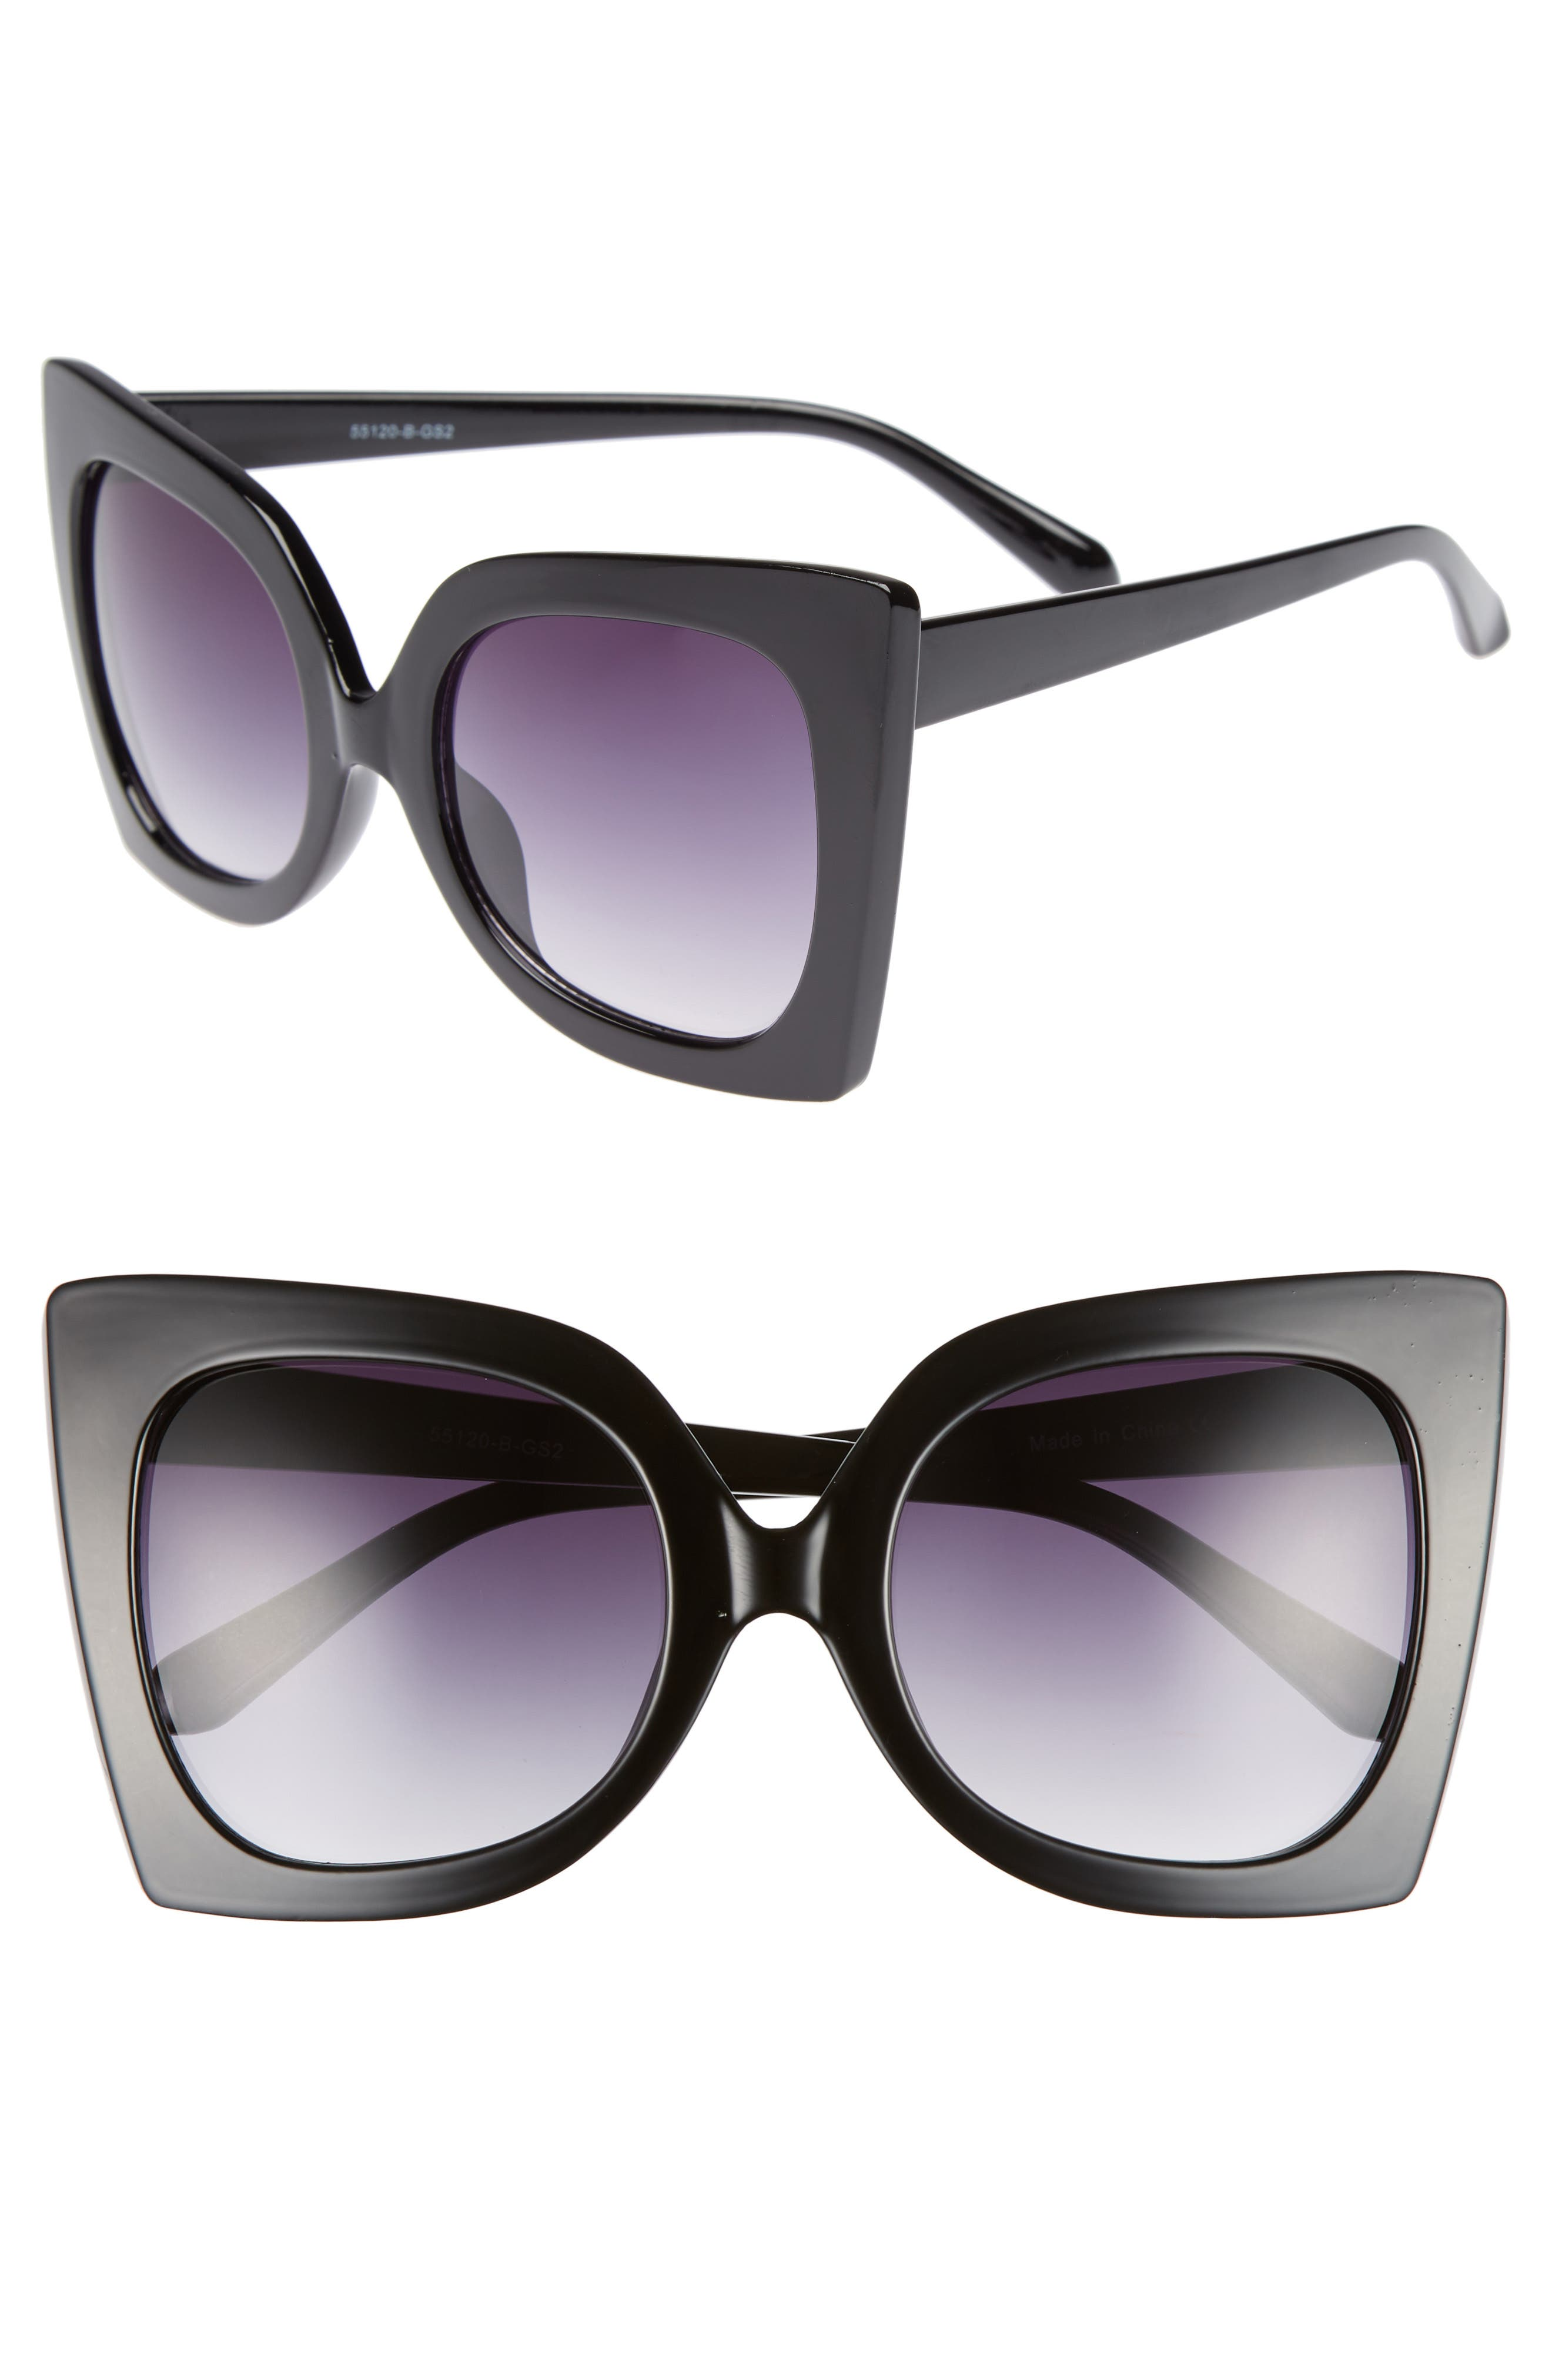 56mm Exaggerated Square Sunglasses,                             Main thumbnail 1, color,                             Black